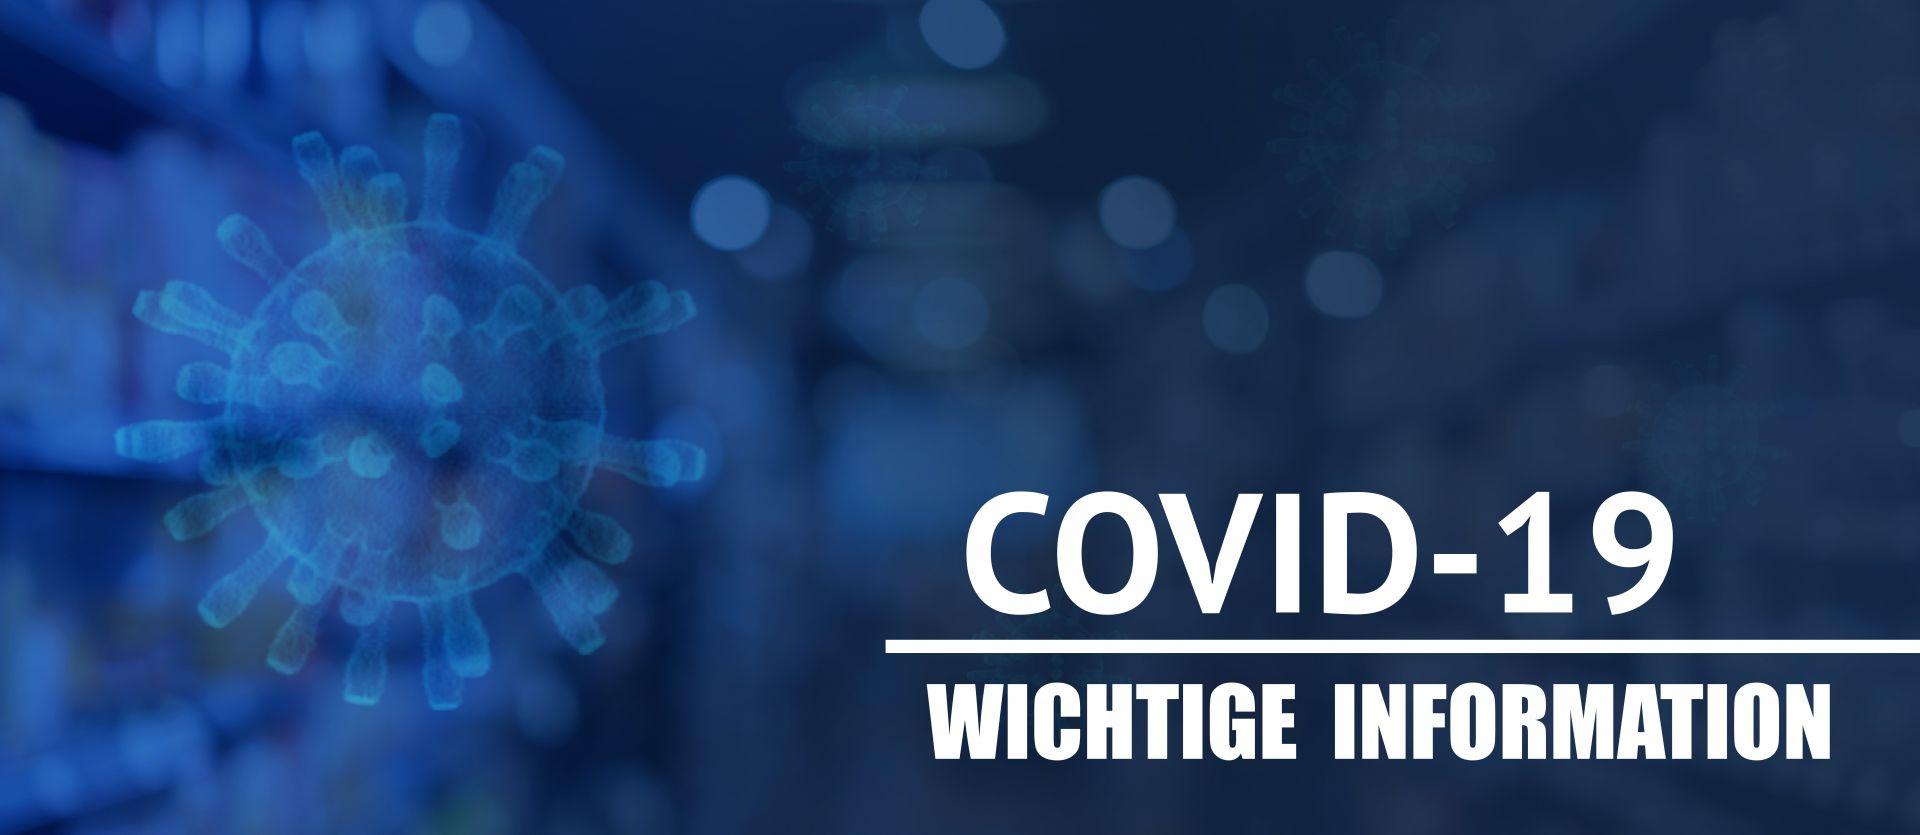 adobestock 335970390 min - Wichtige Information: Corona-Risiko-Gebiete und Corona-Tests